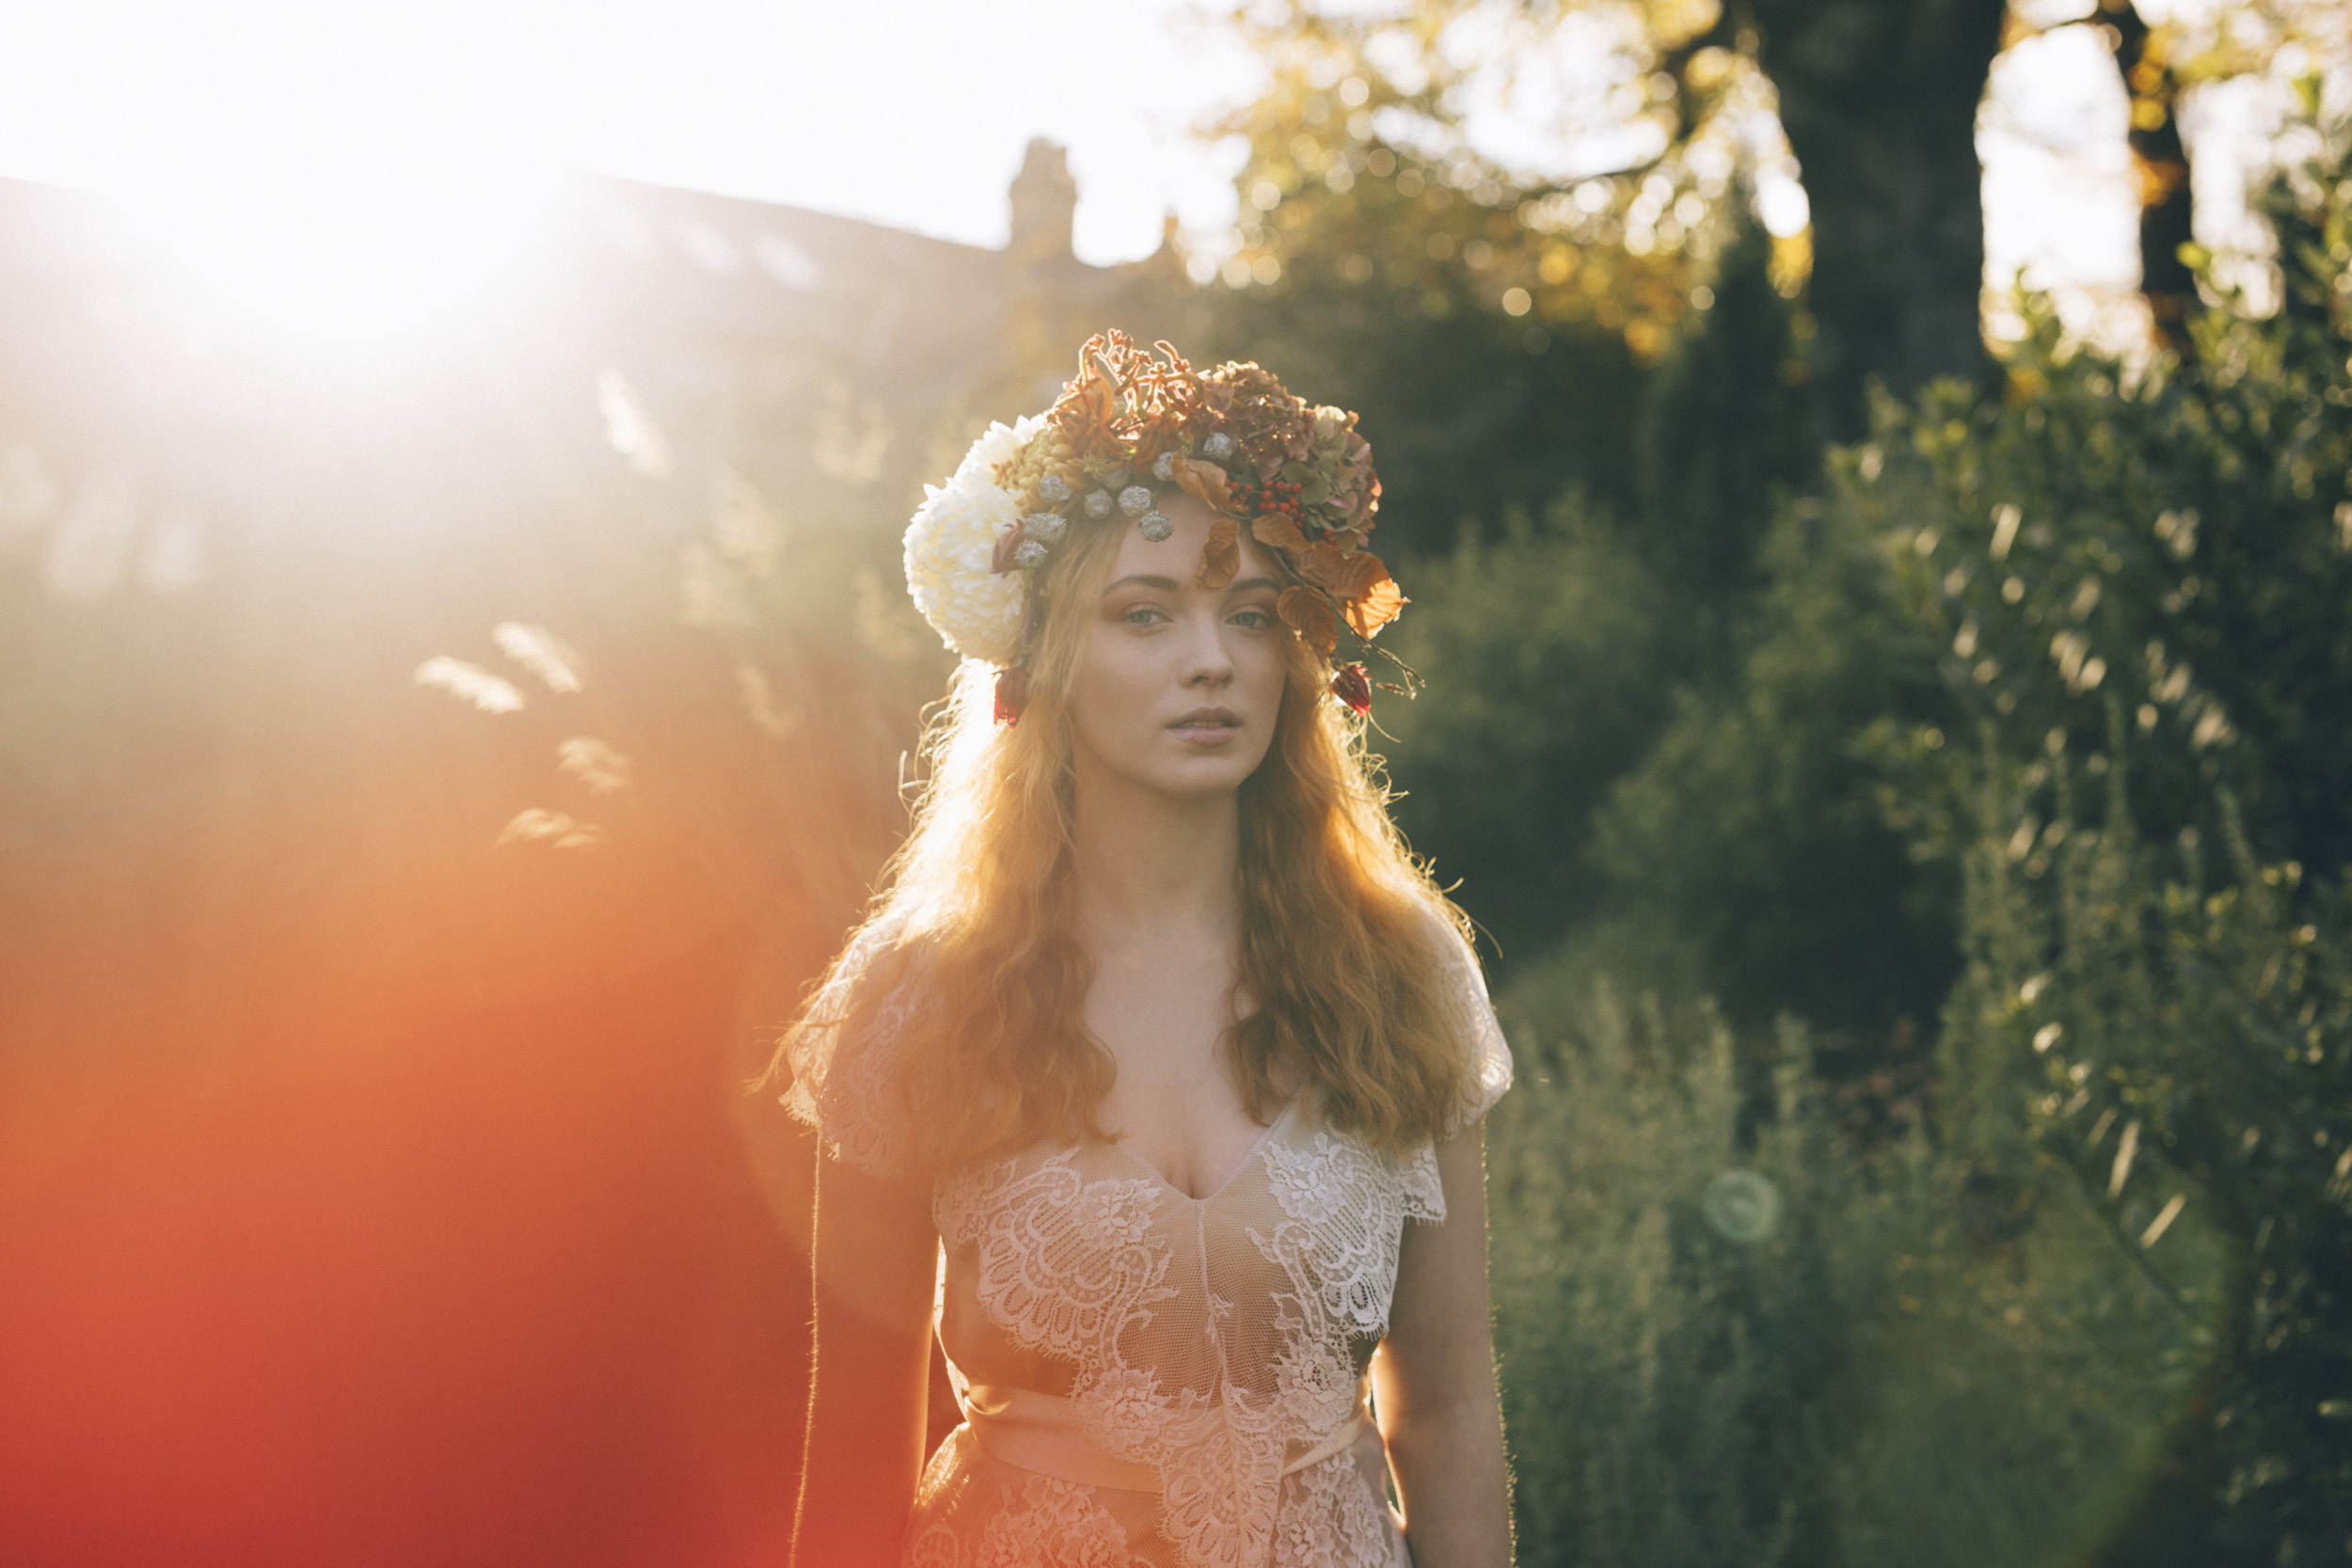 Autumn-Leaves-Shelley-Richmond-Kate-Beaumont-Sheffield-6.jpg